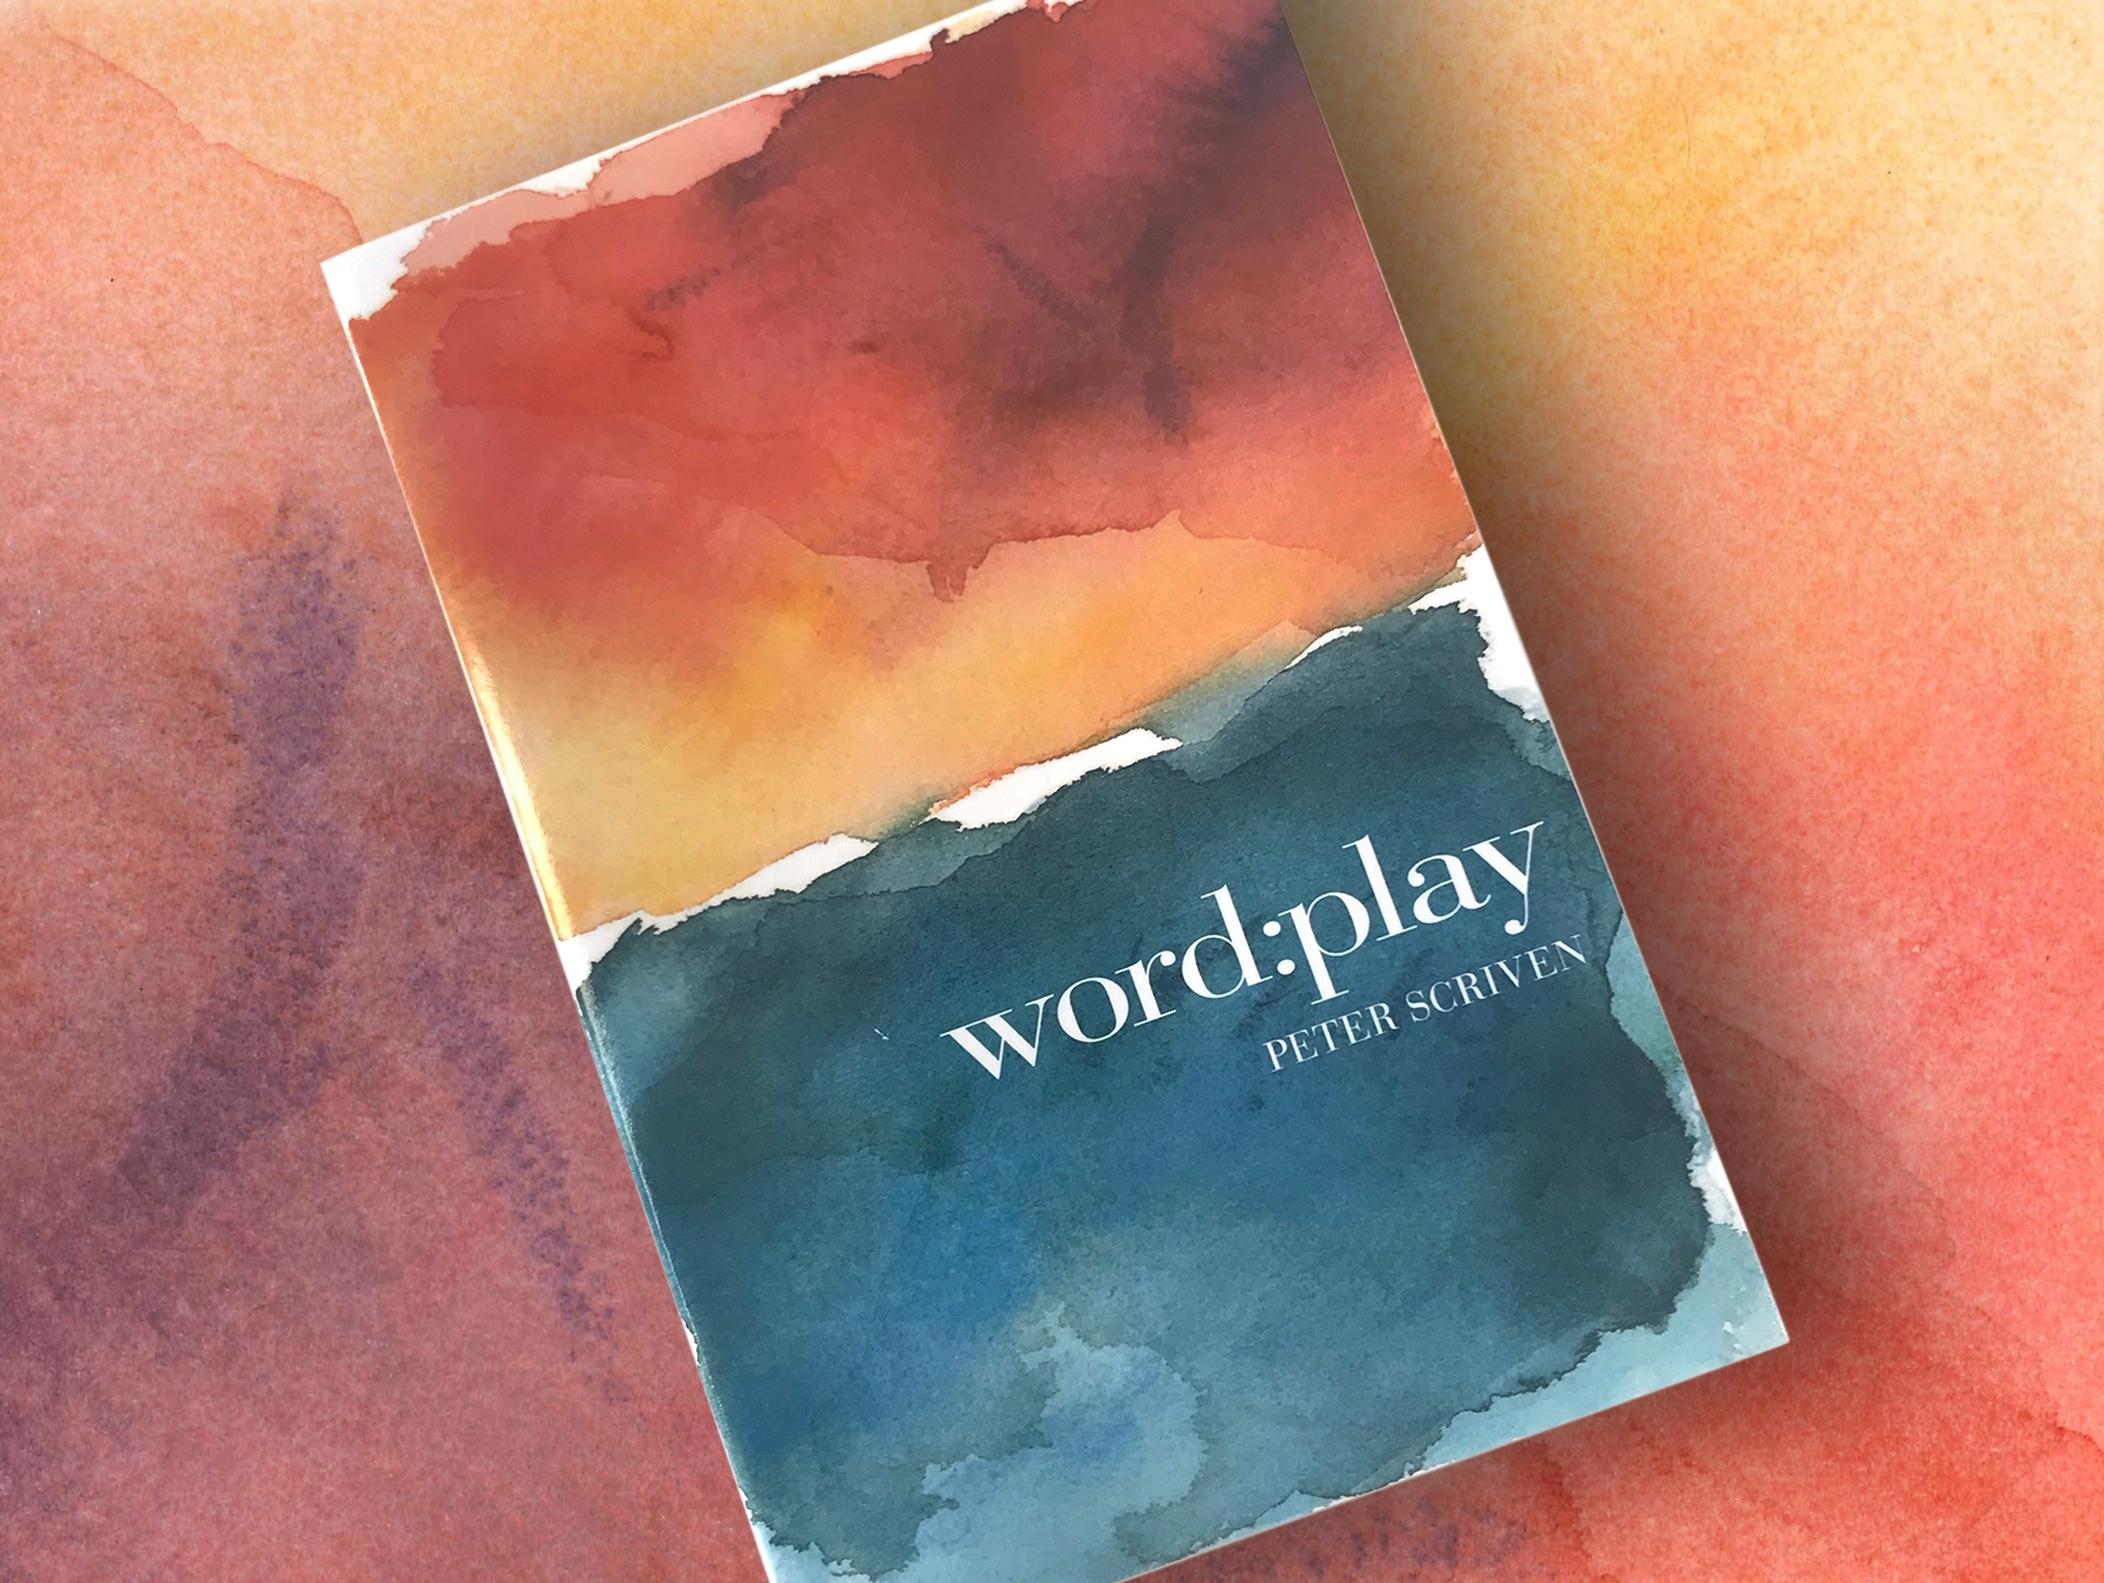 WORD:PLAY